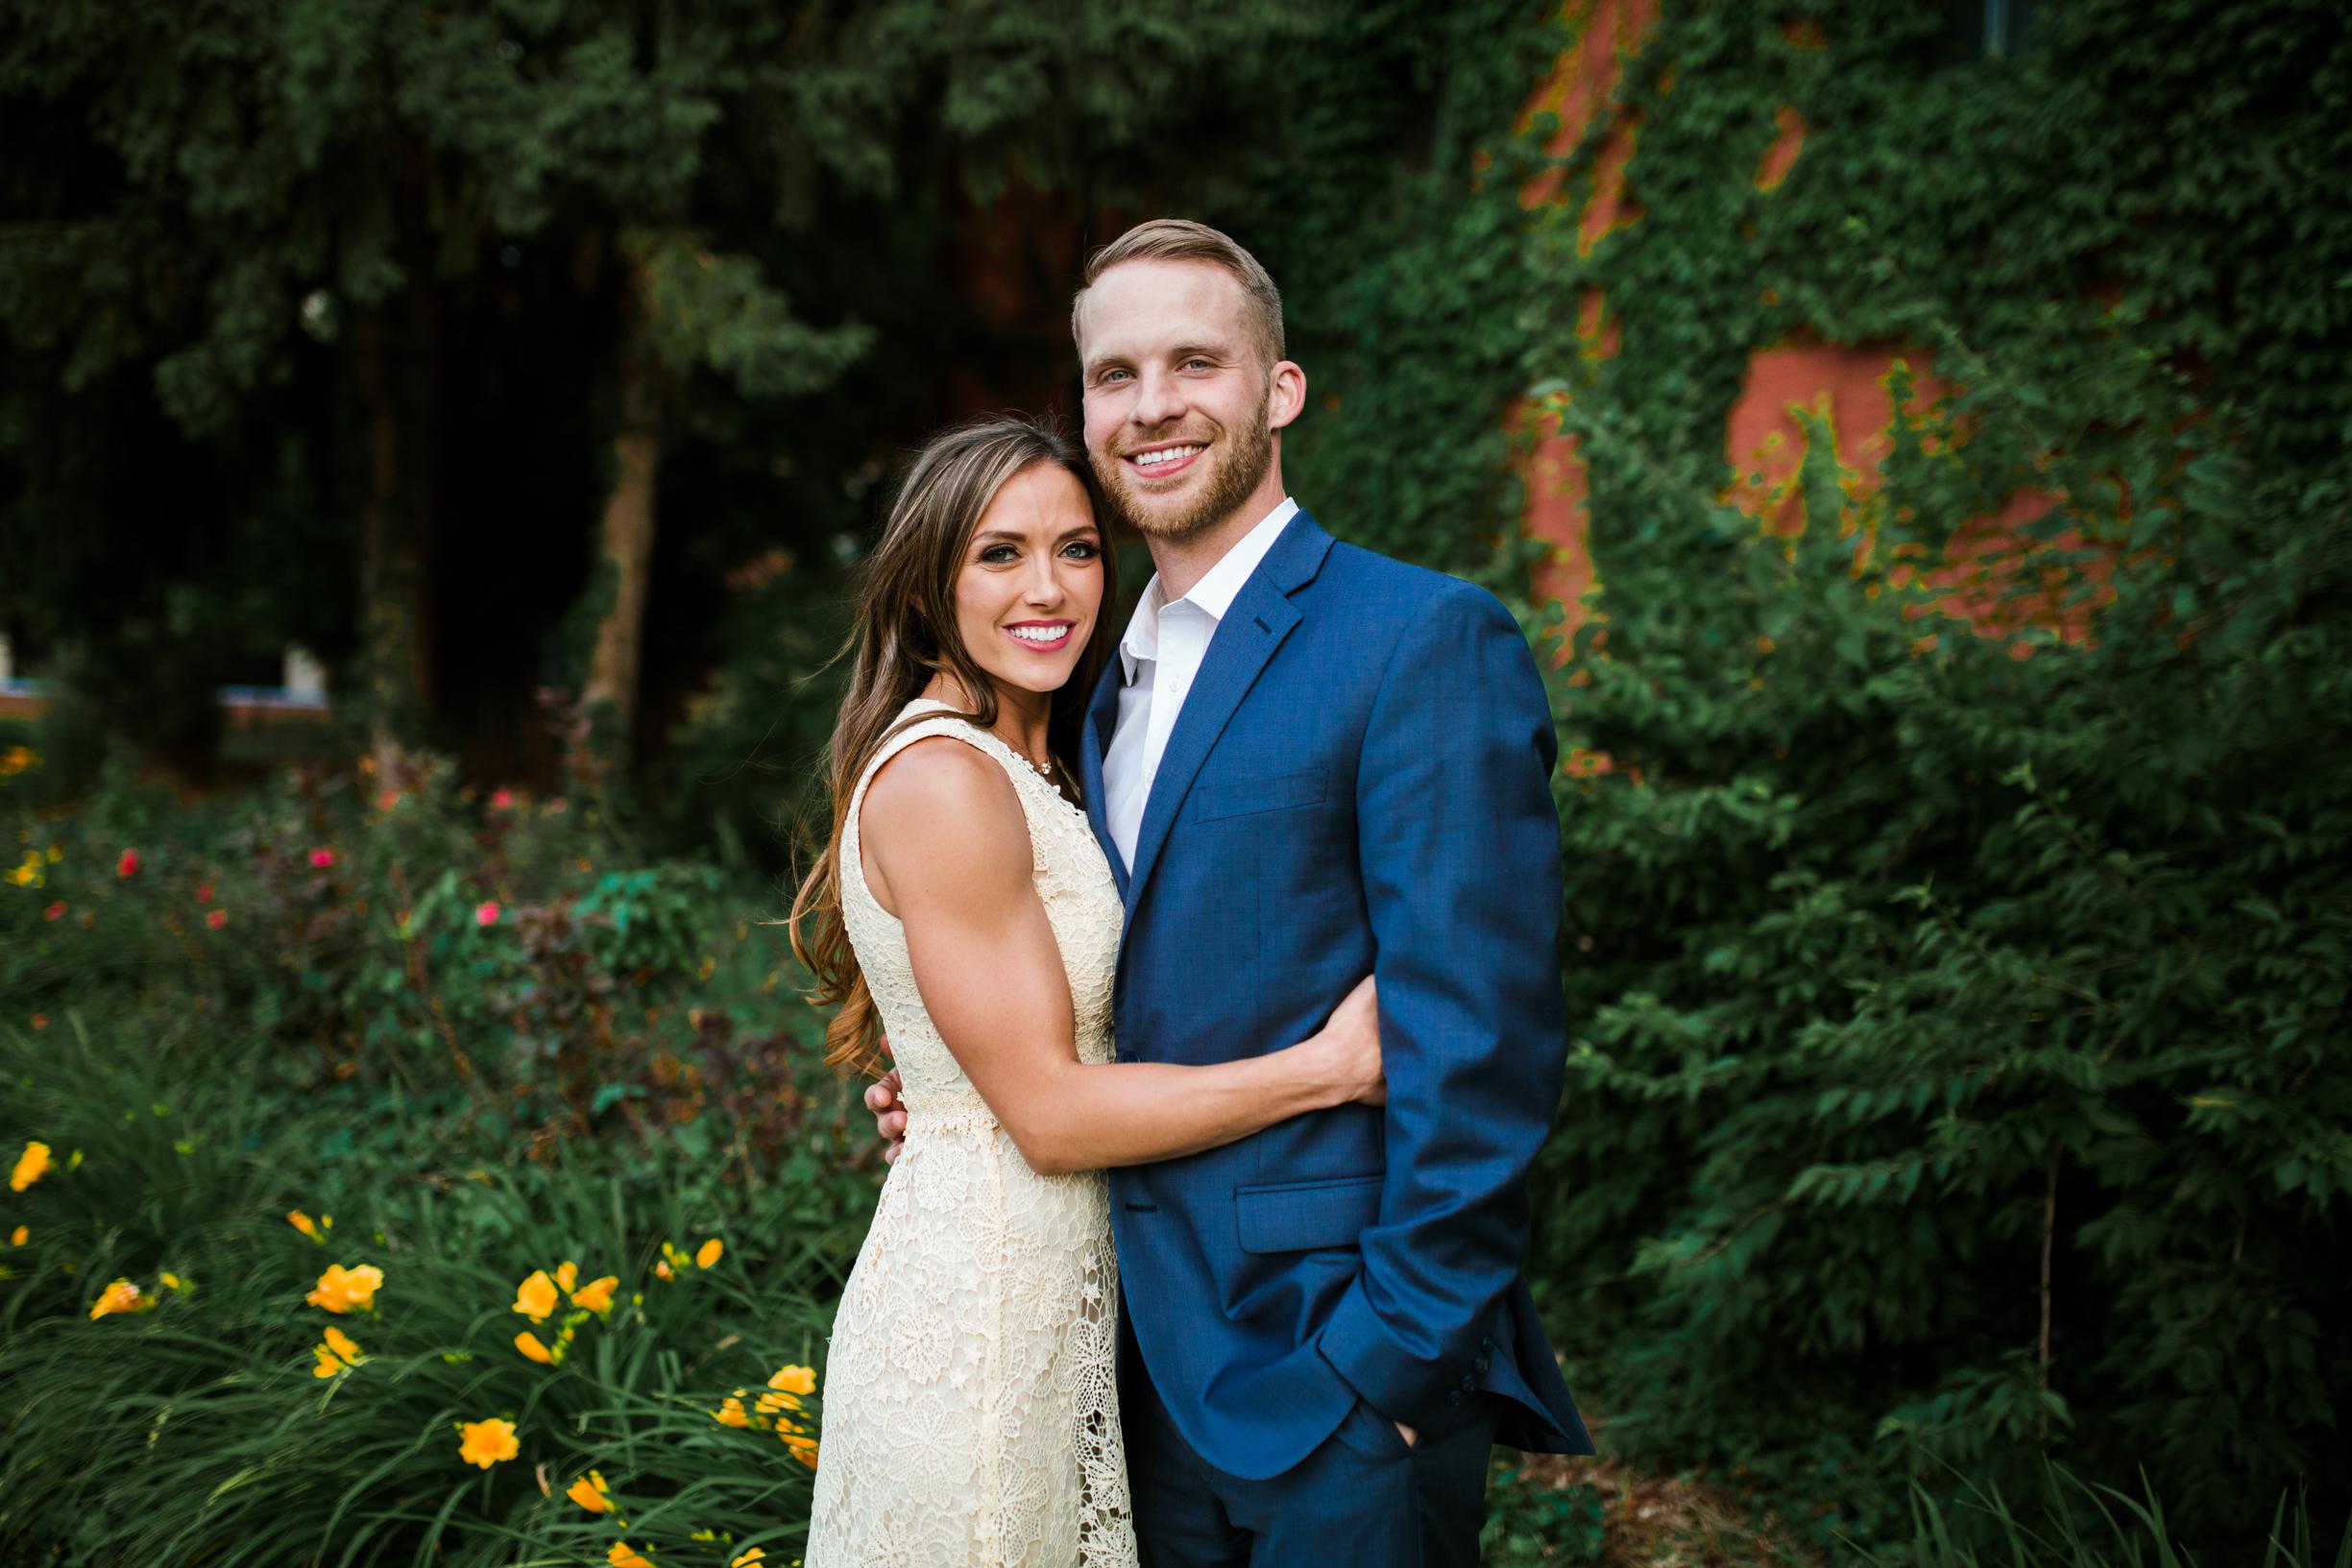 Victoria & Chad Engagement 2018 Crystal Ludwick Photo Louisville Kentucky Wedding Photographer WEBSITE (48 of 48).jpg